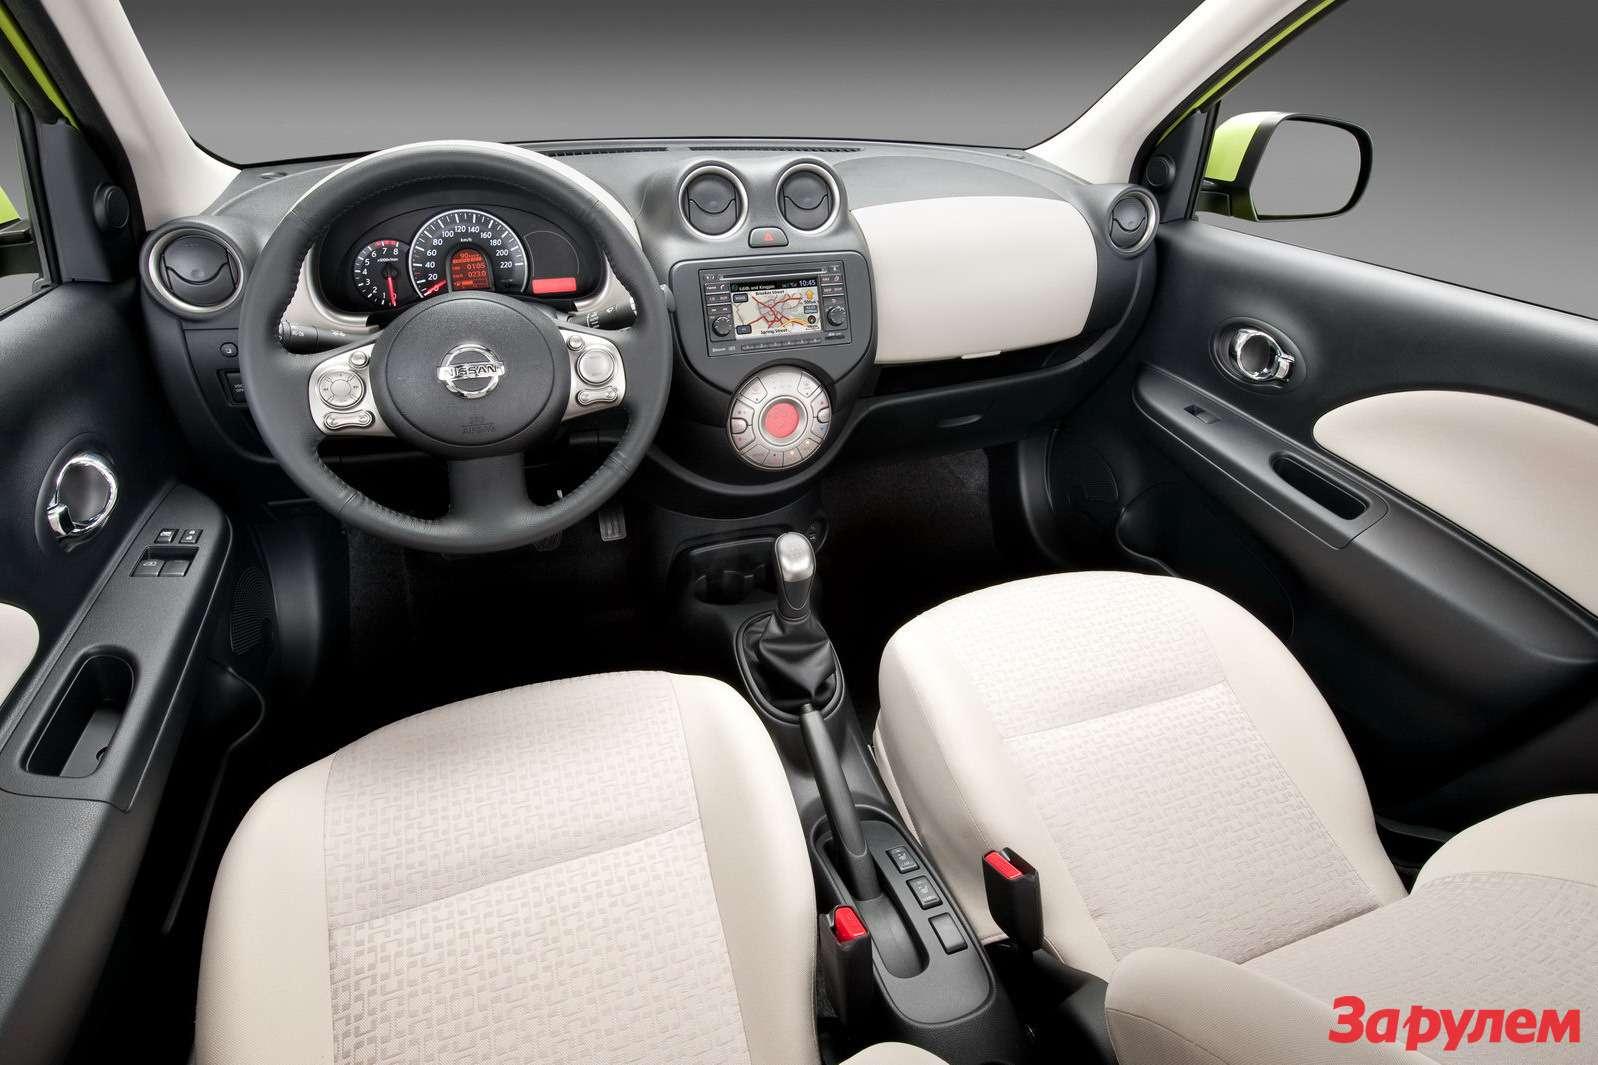 2010-Nissan-Micra5